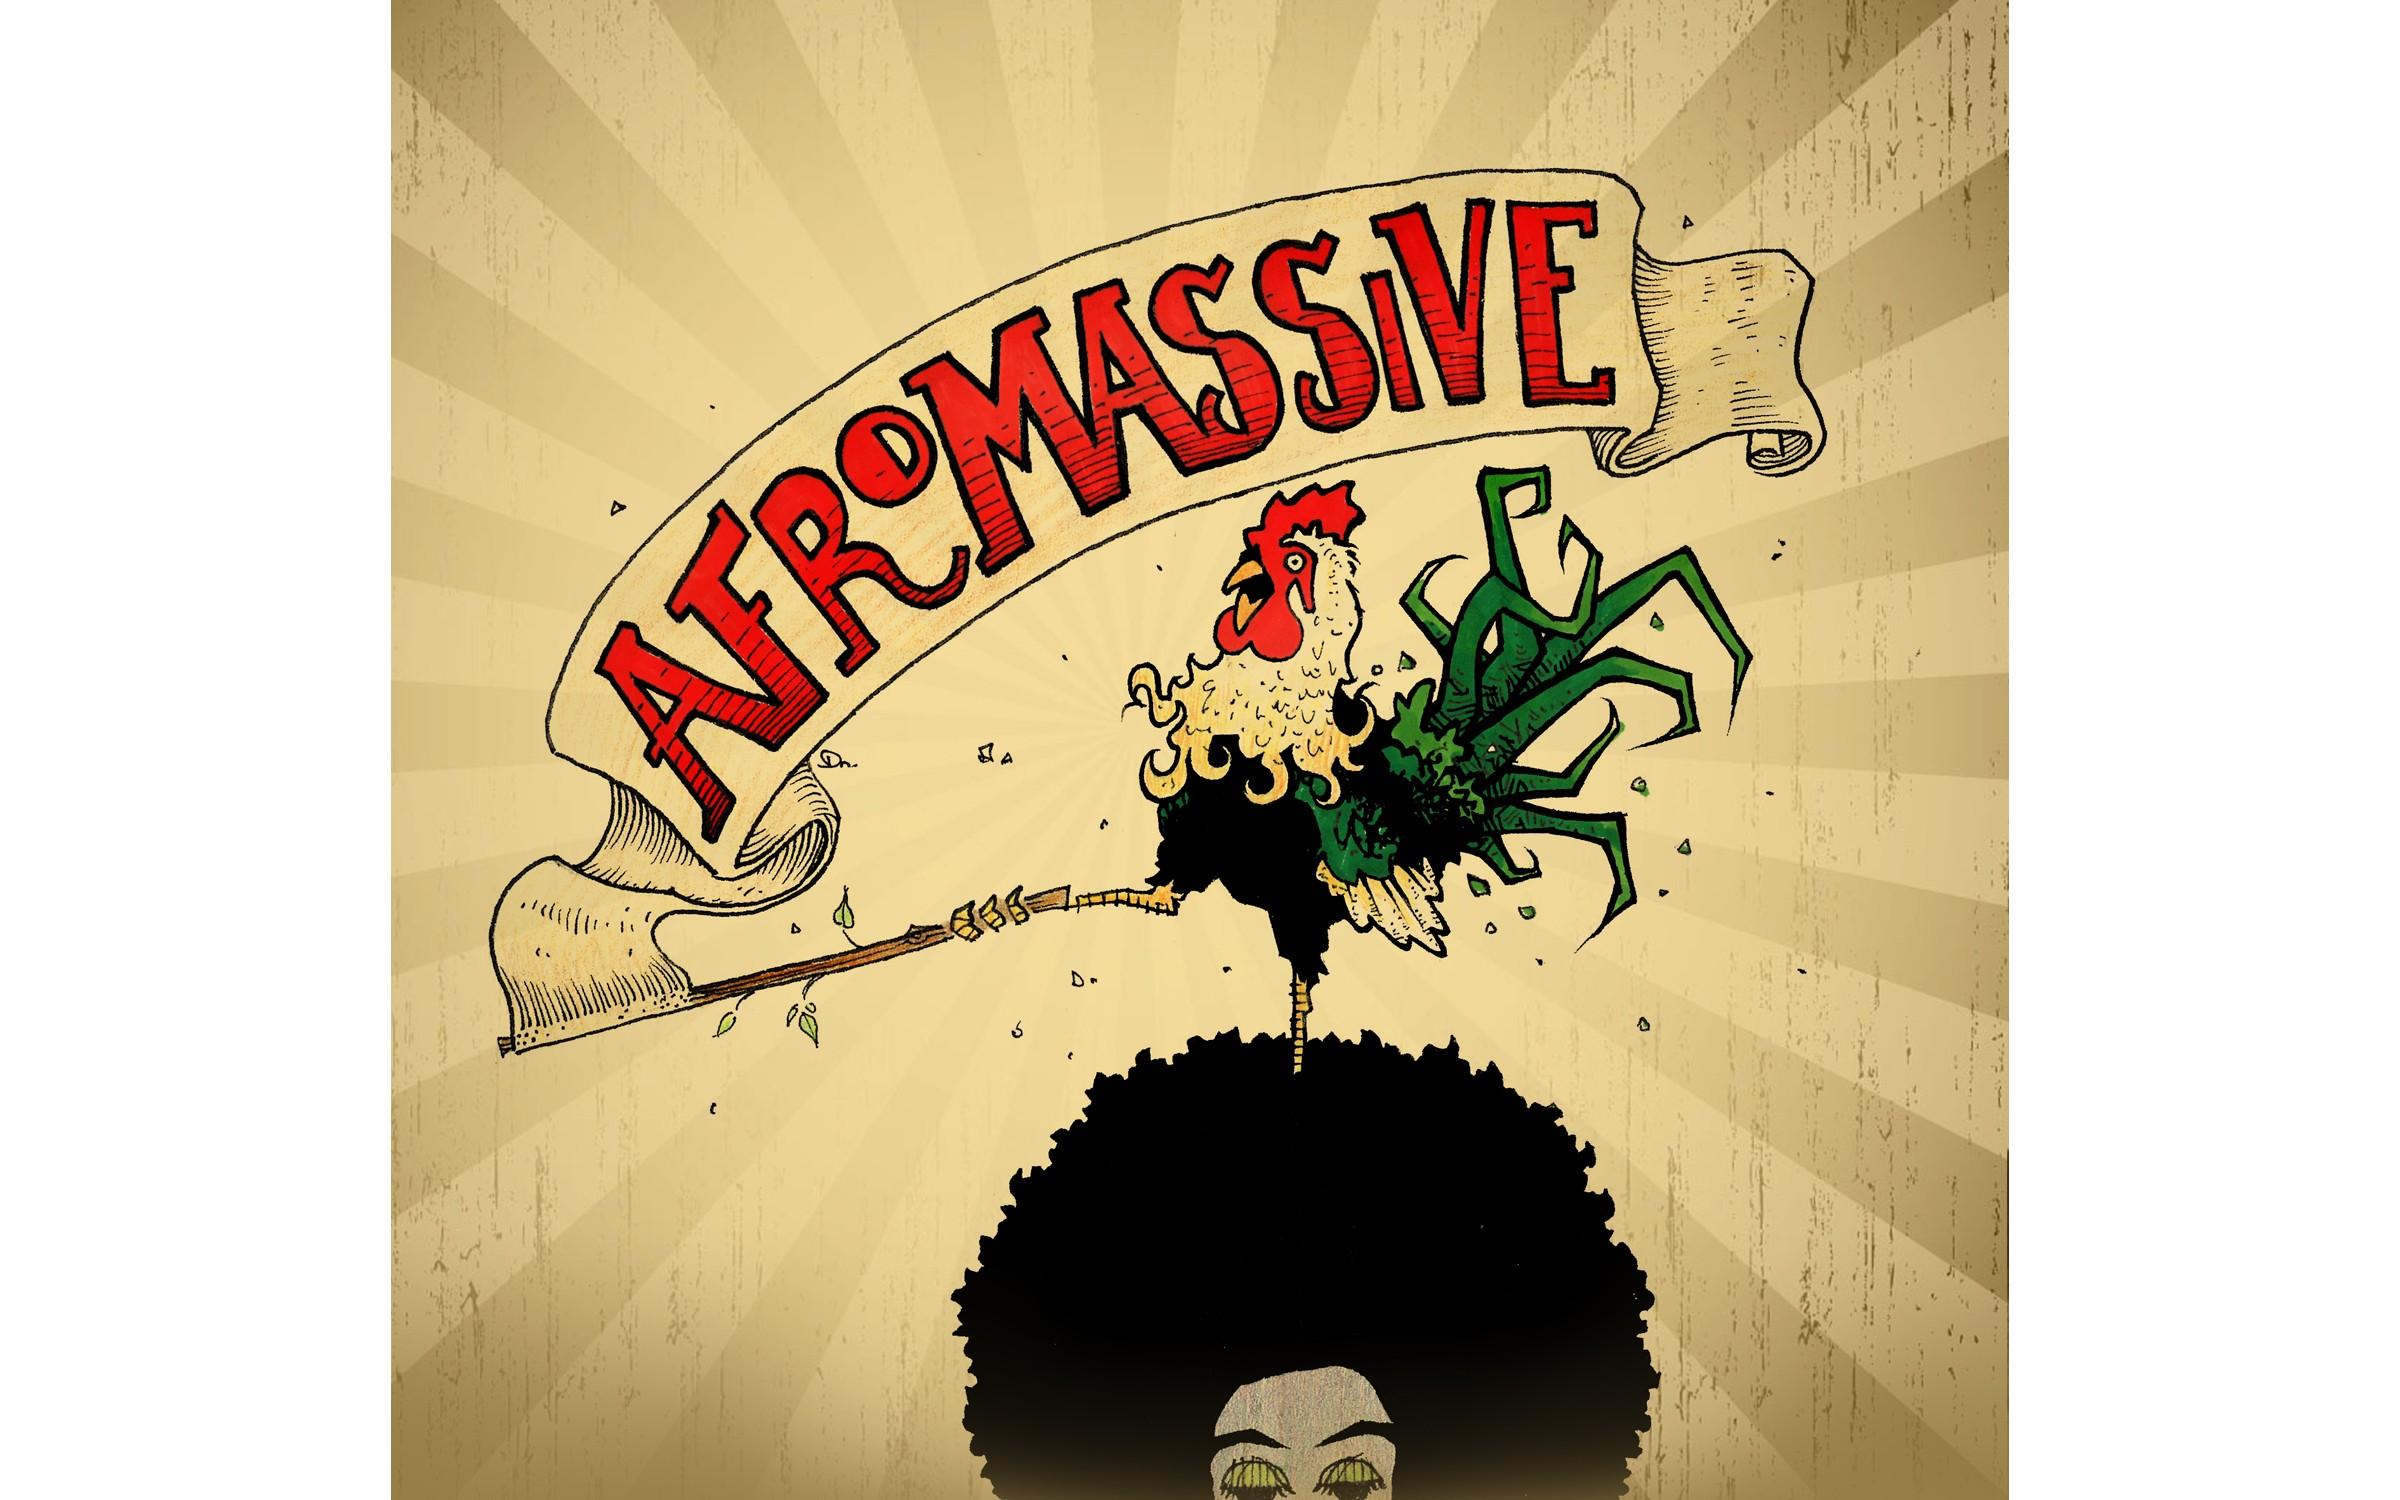 Afromassive's Gridlock cover - ARTWORK BY DREW MOHR, GRAPHIC DESIGN BY PAMELA JOHNSON